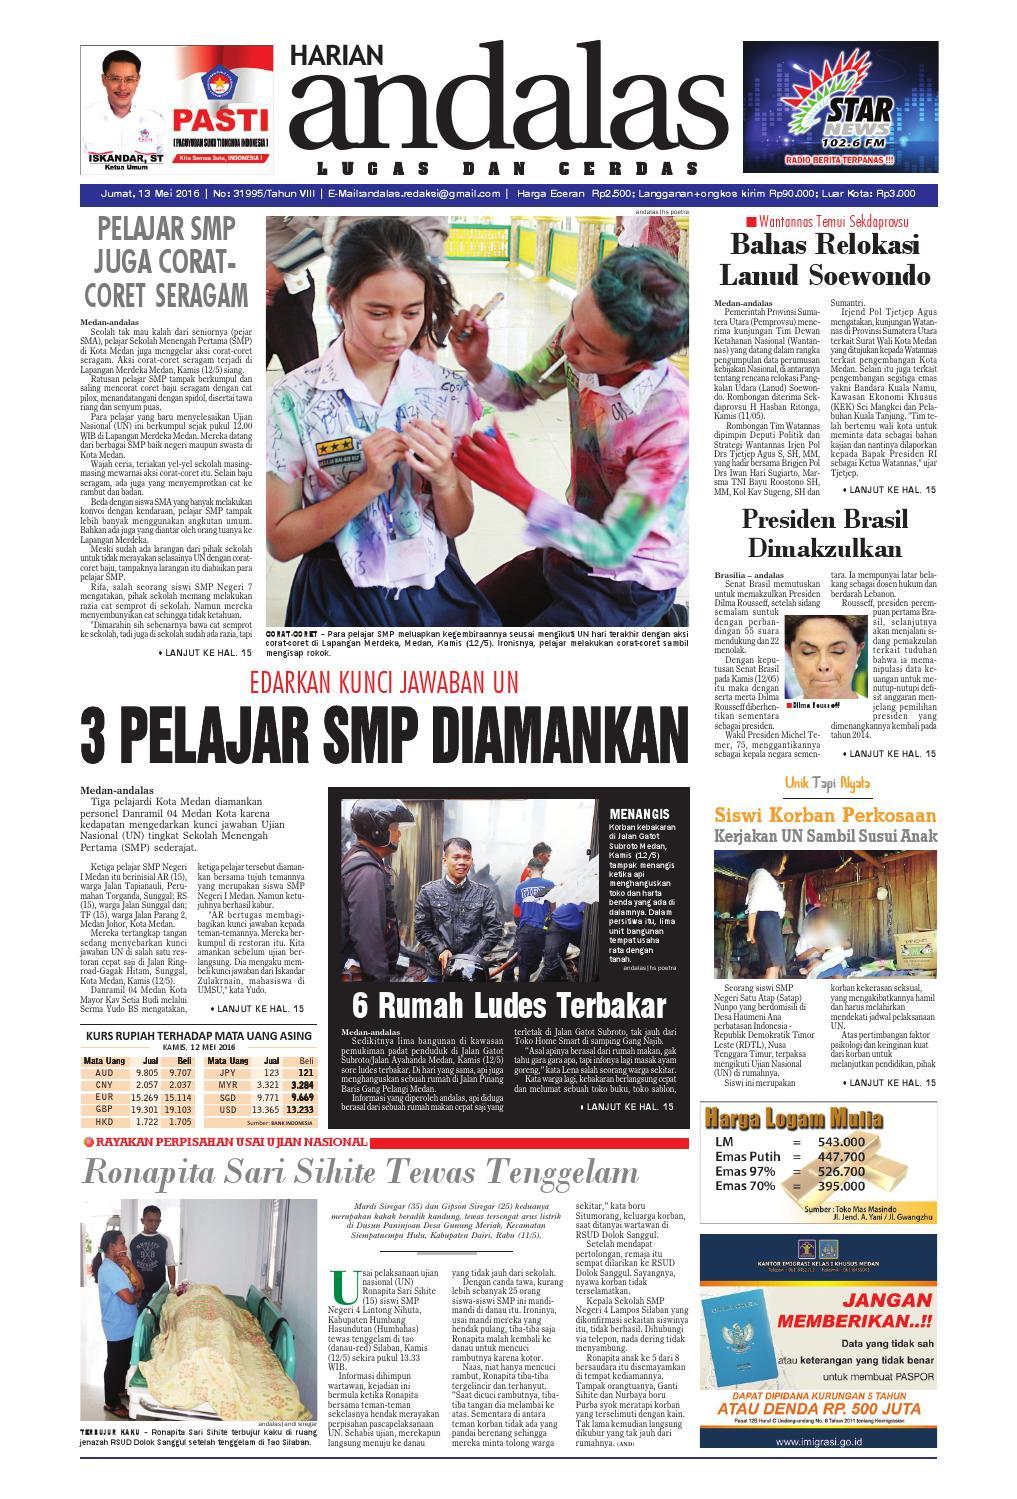 Epaper Andalas Edisi Jumat 13 Mei 2016 By Media Issuu Warior Lc Pendek All Black Sekolah Prsmuka Kerja Santai Main Anak Dewasa